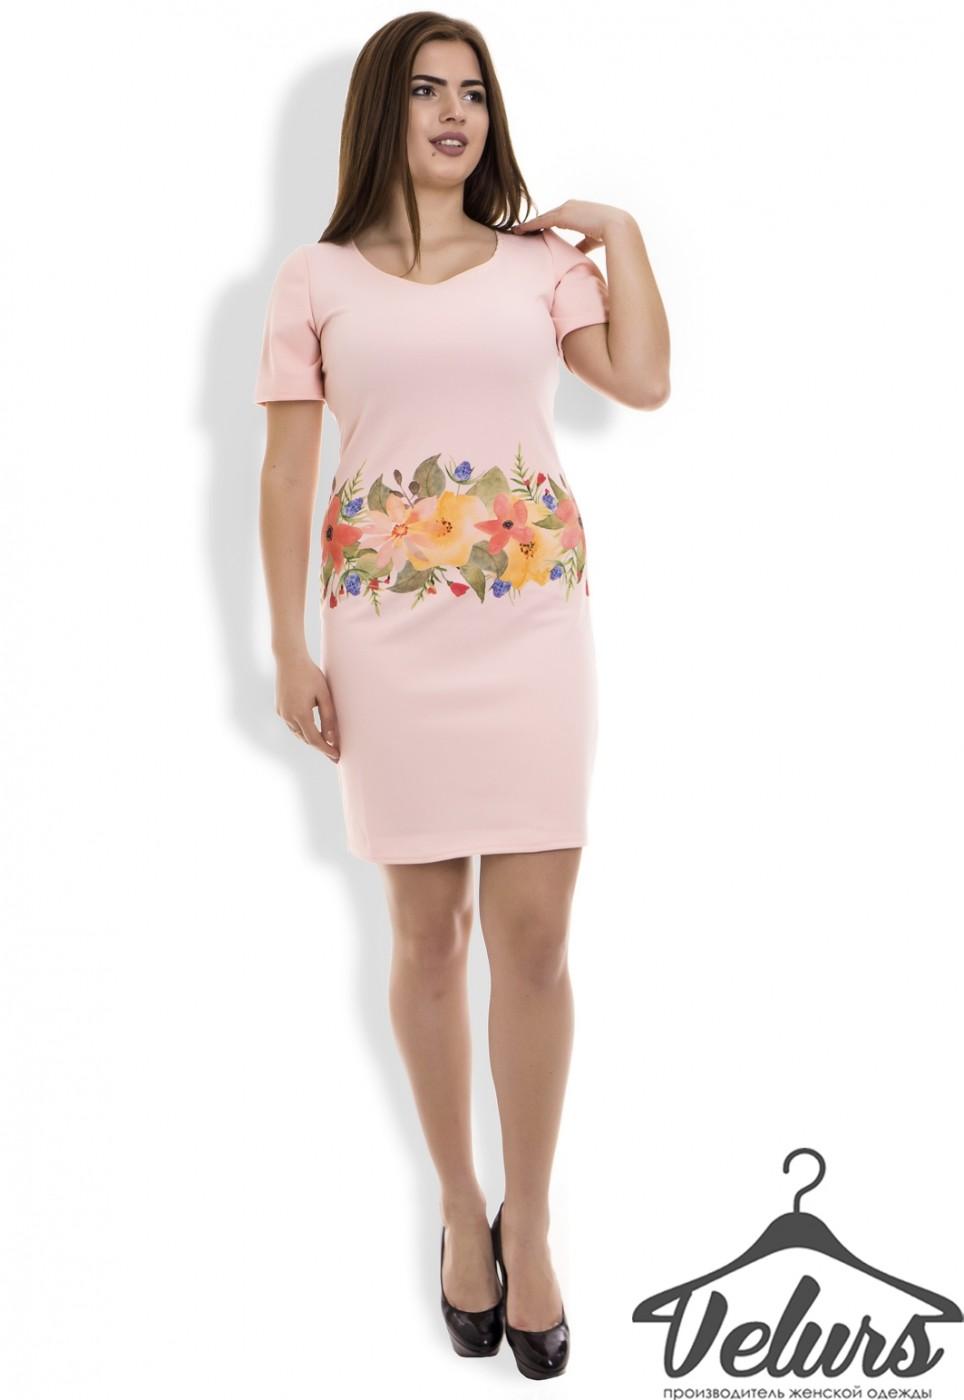 Velurs: Платье 212126 - фото 7